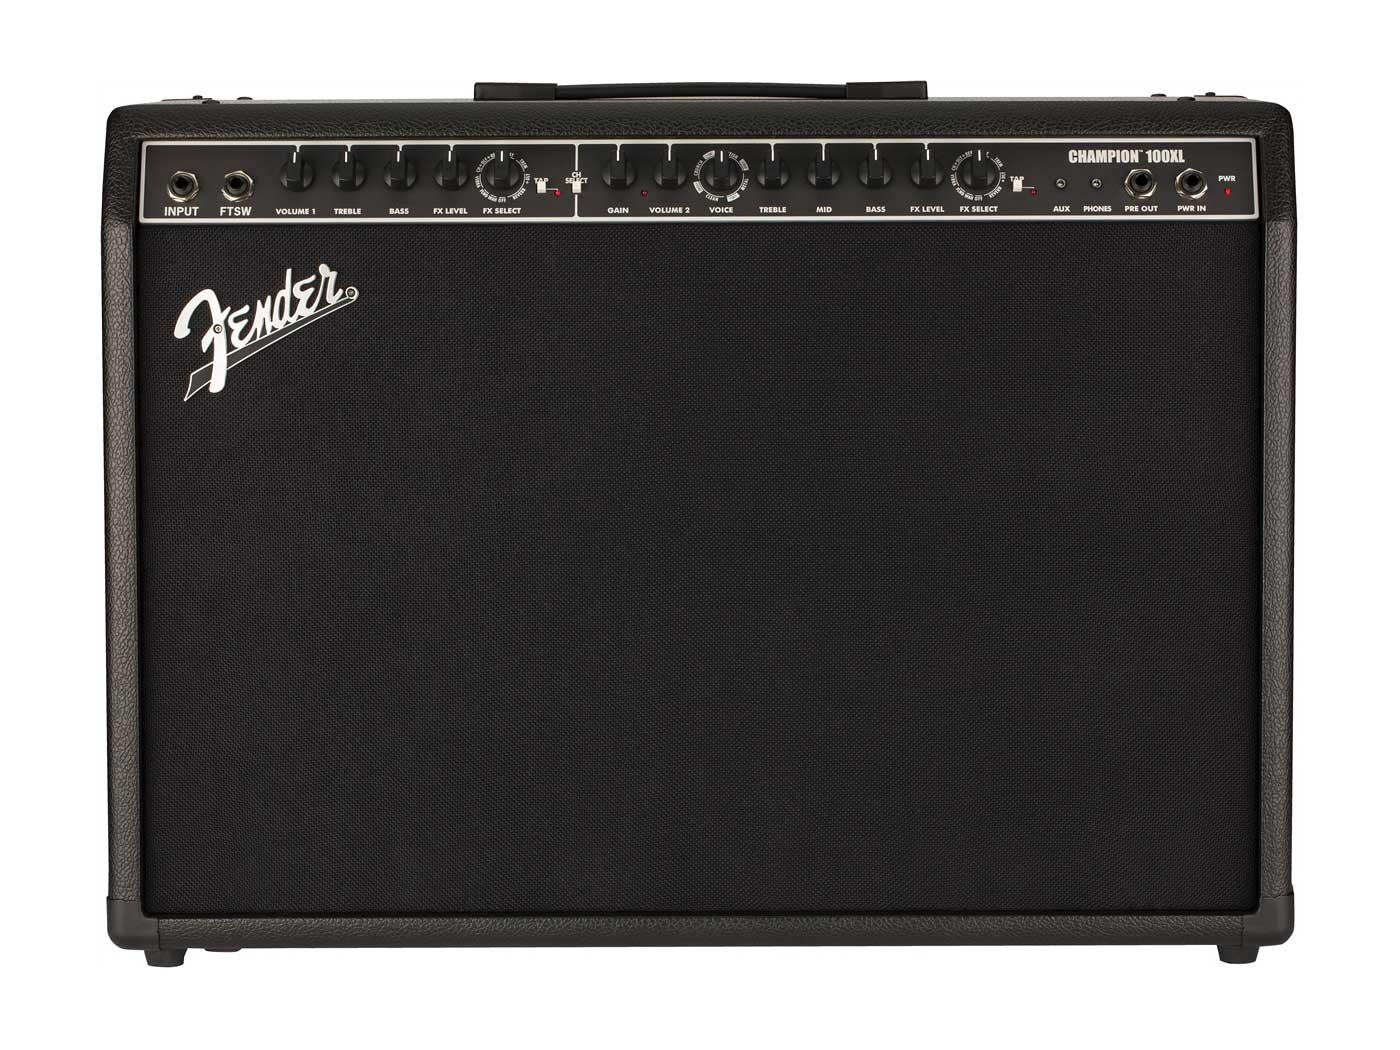 The Fender Champion 100XL